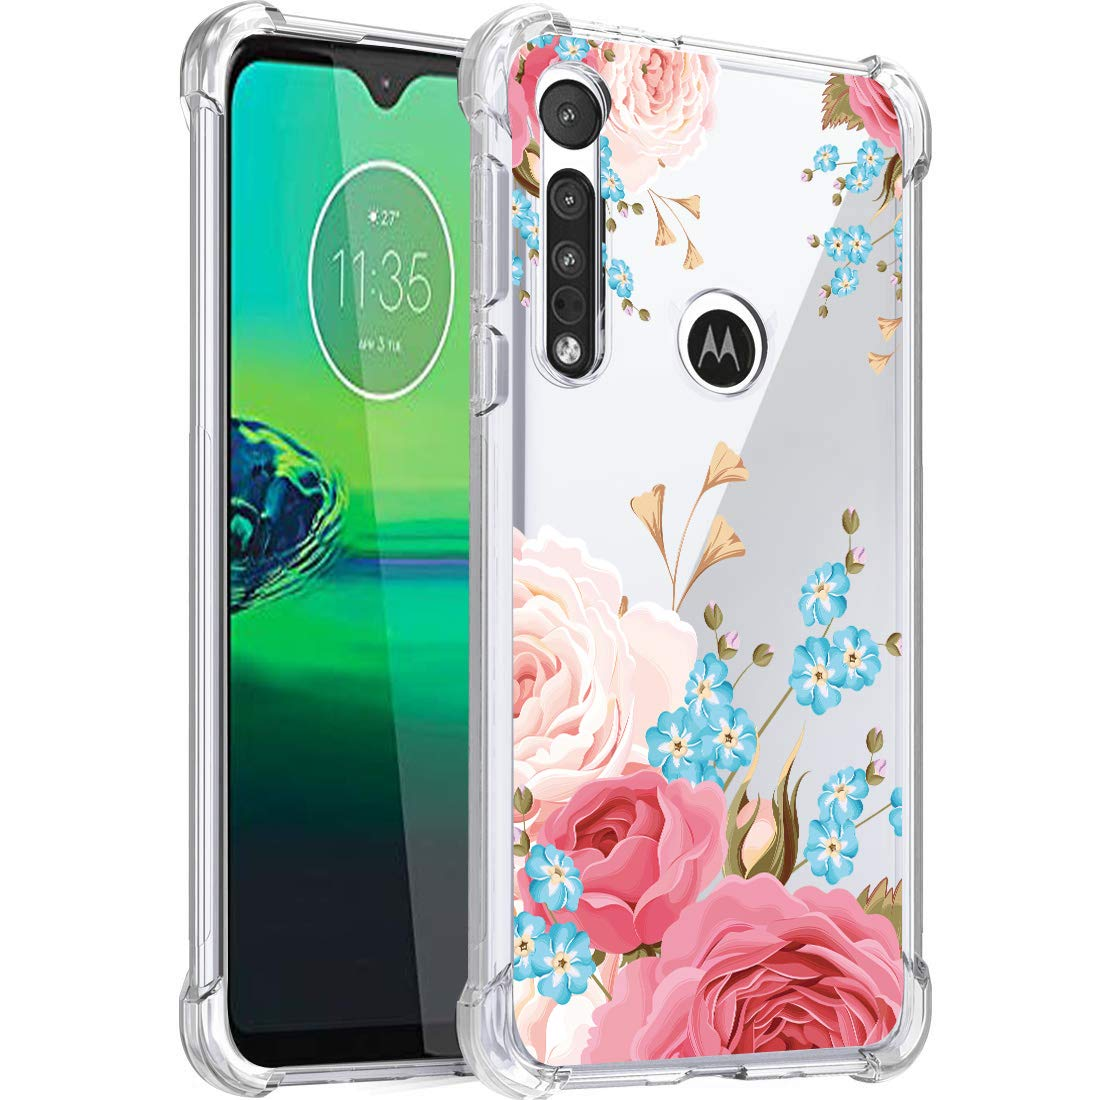 Funda Para Motorola G8 Play / Motorola One Macro  (46sw)